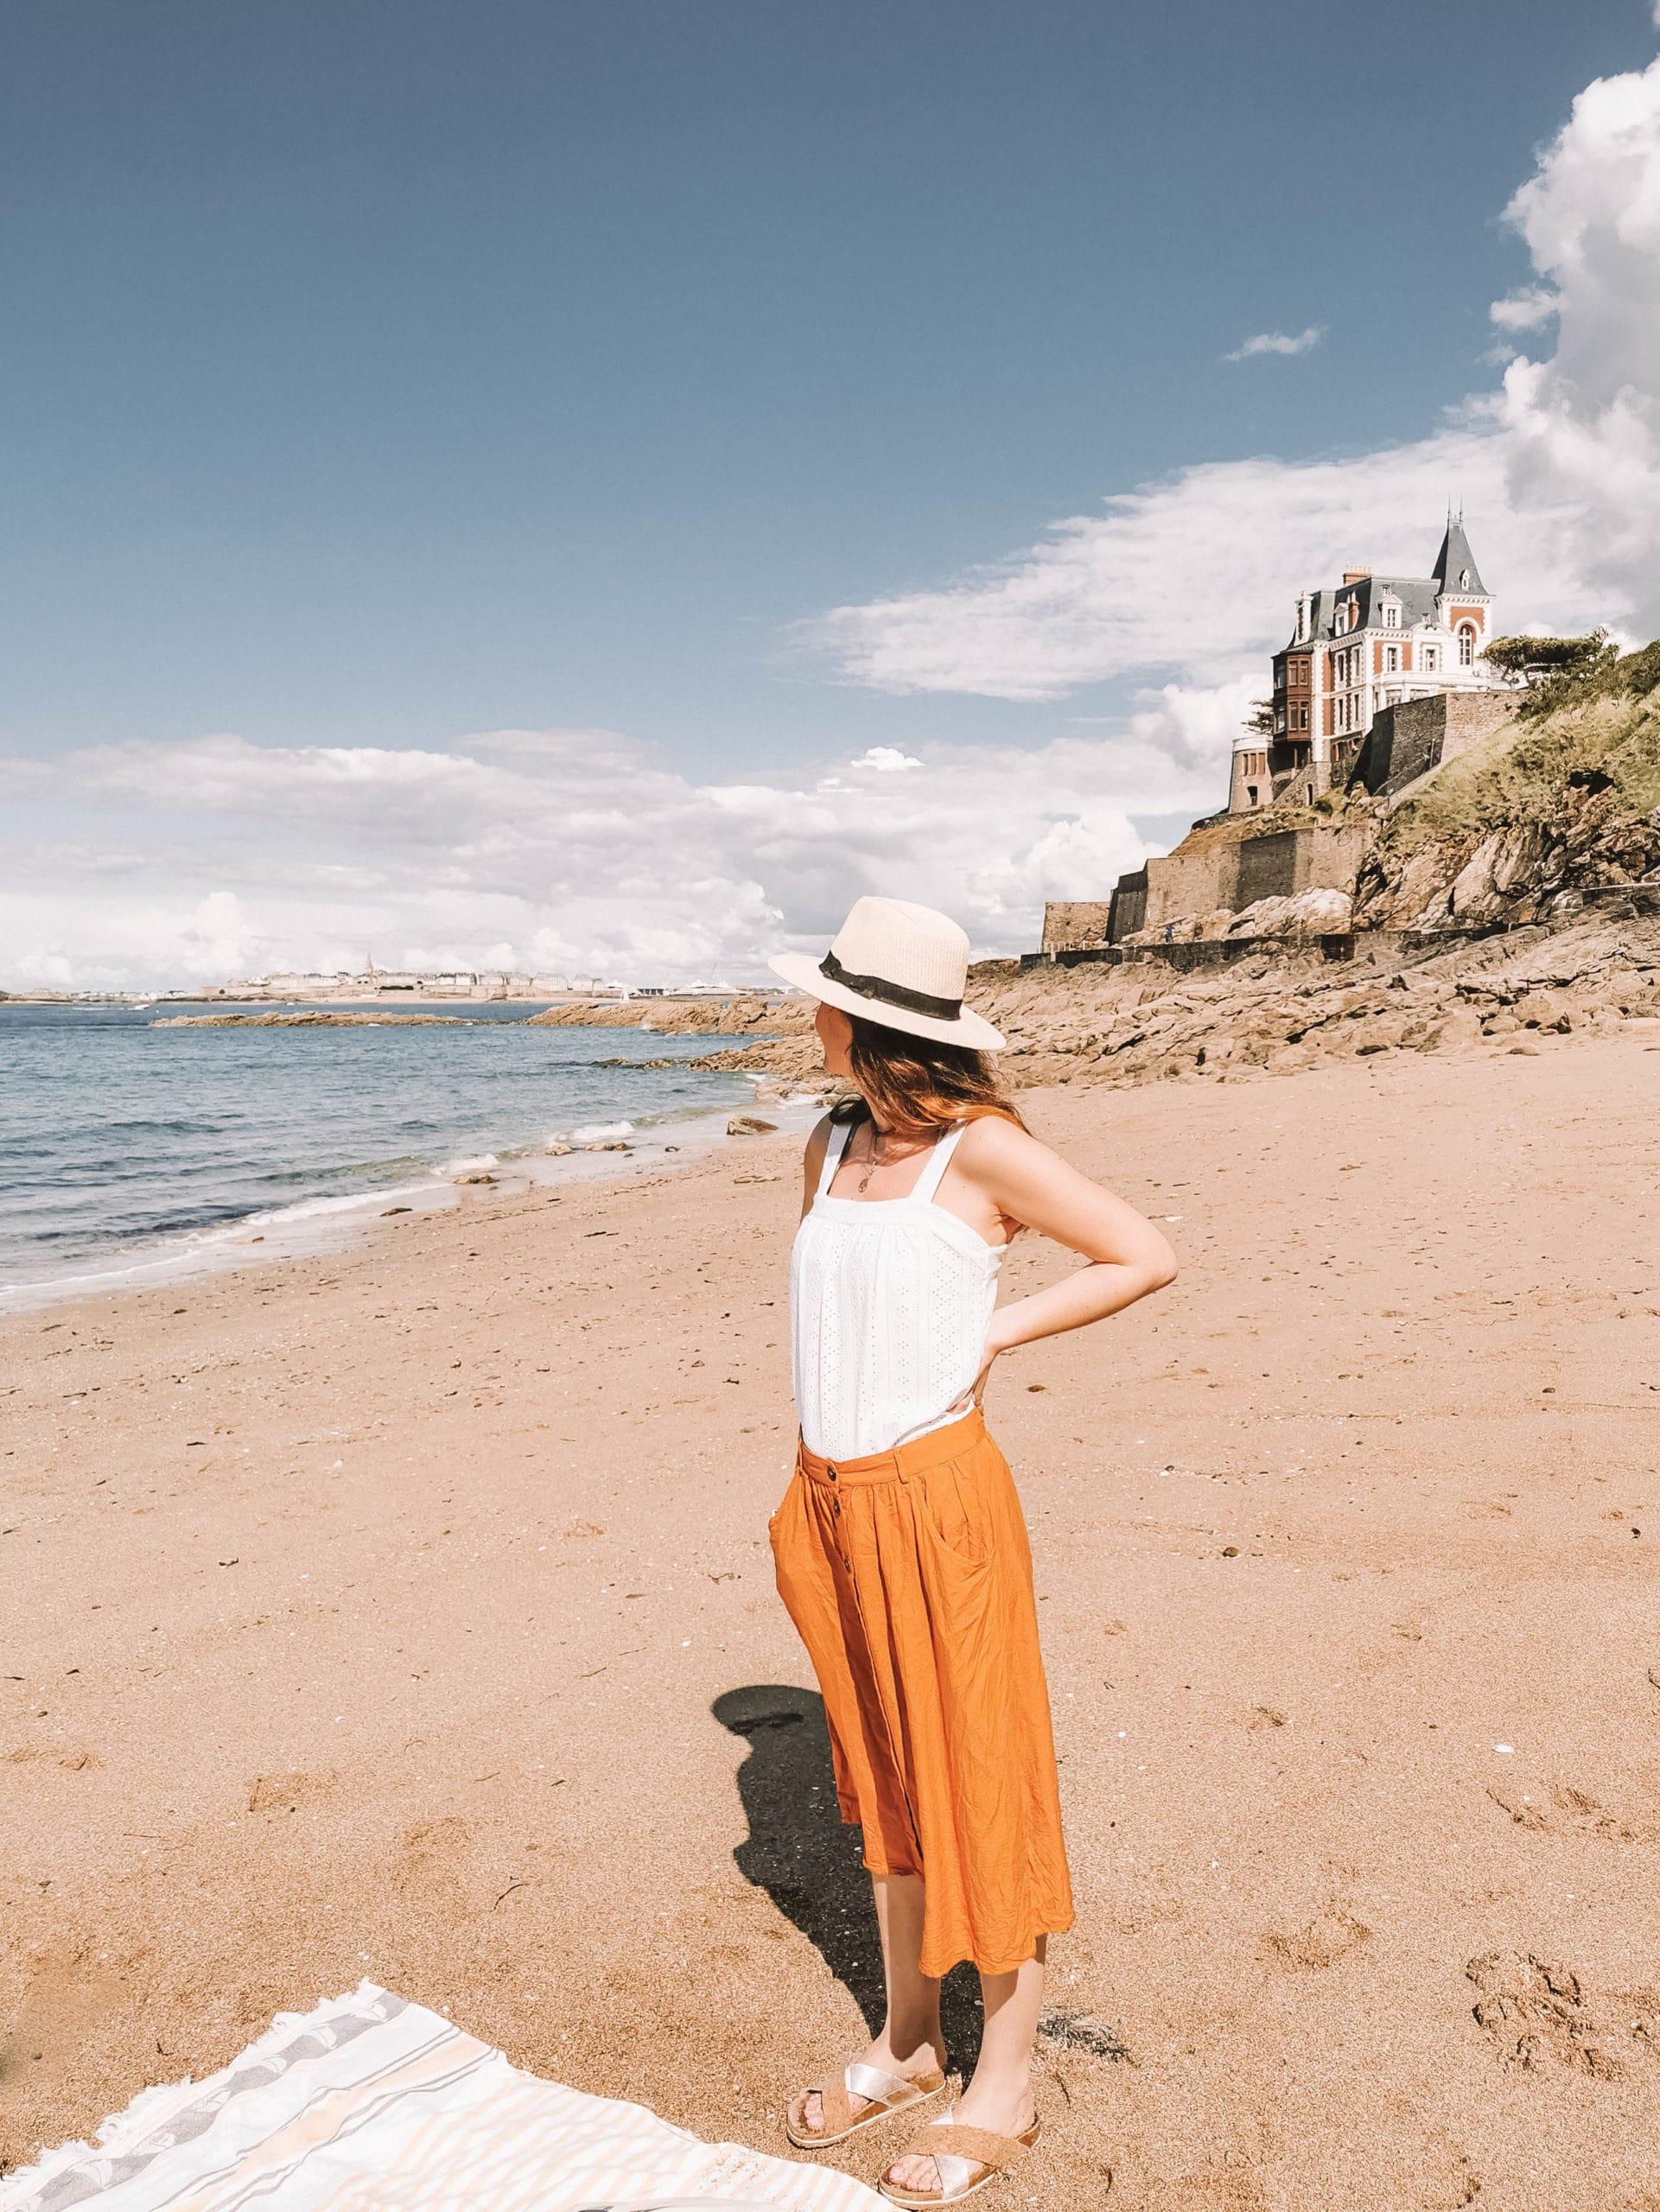 Perrine qui admire la plage de la Malouine à Dinard